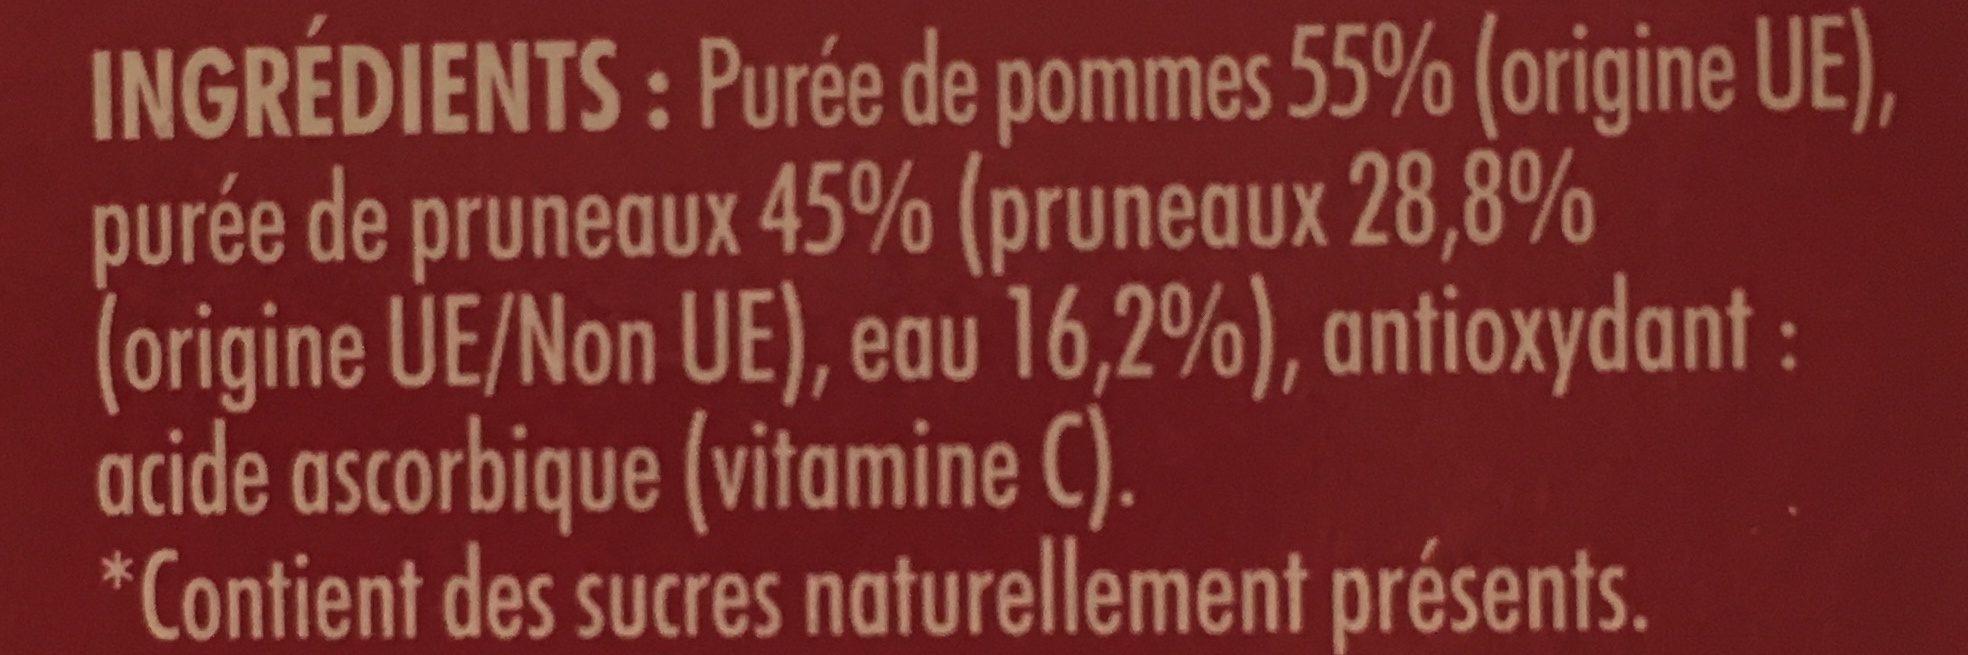 Dessert Fruitiers Pommes / Pruneaux 4 x 100 g - Ingrédients